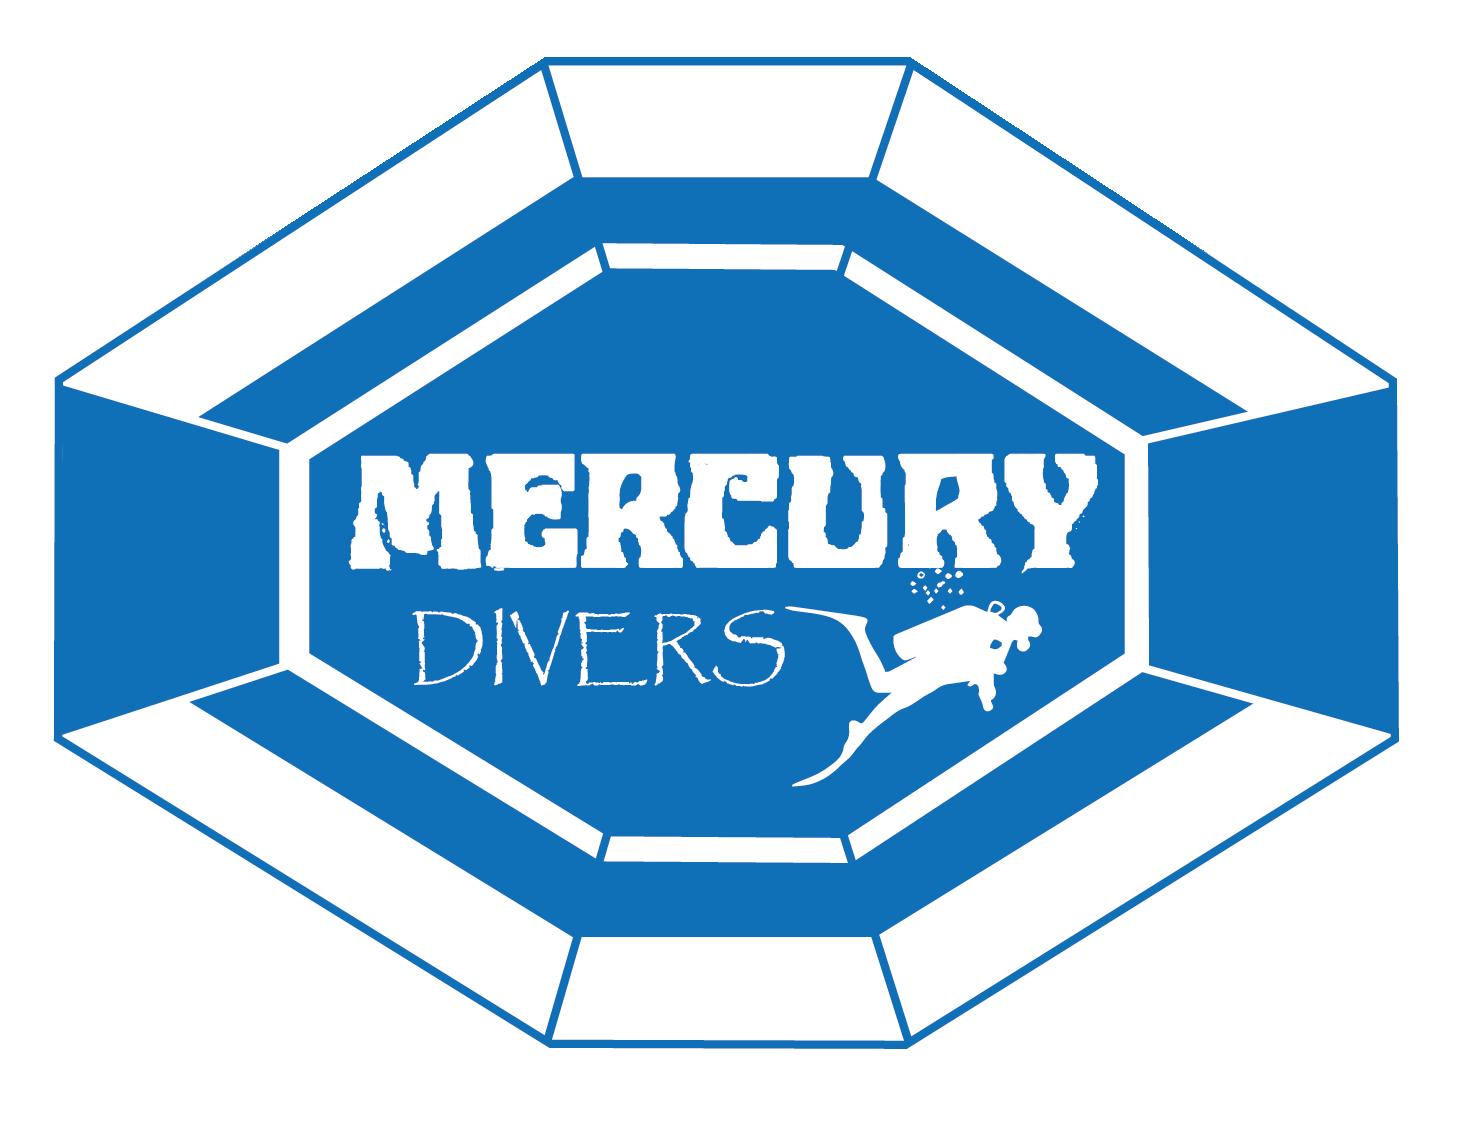 mercury divers